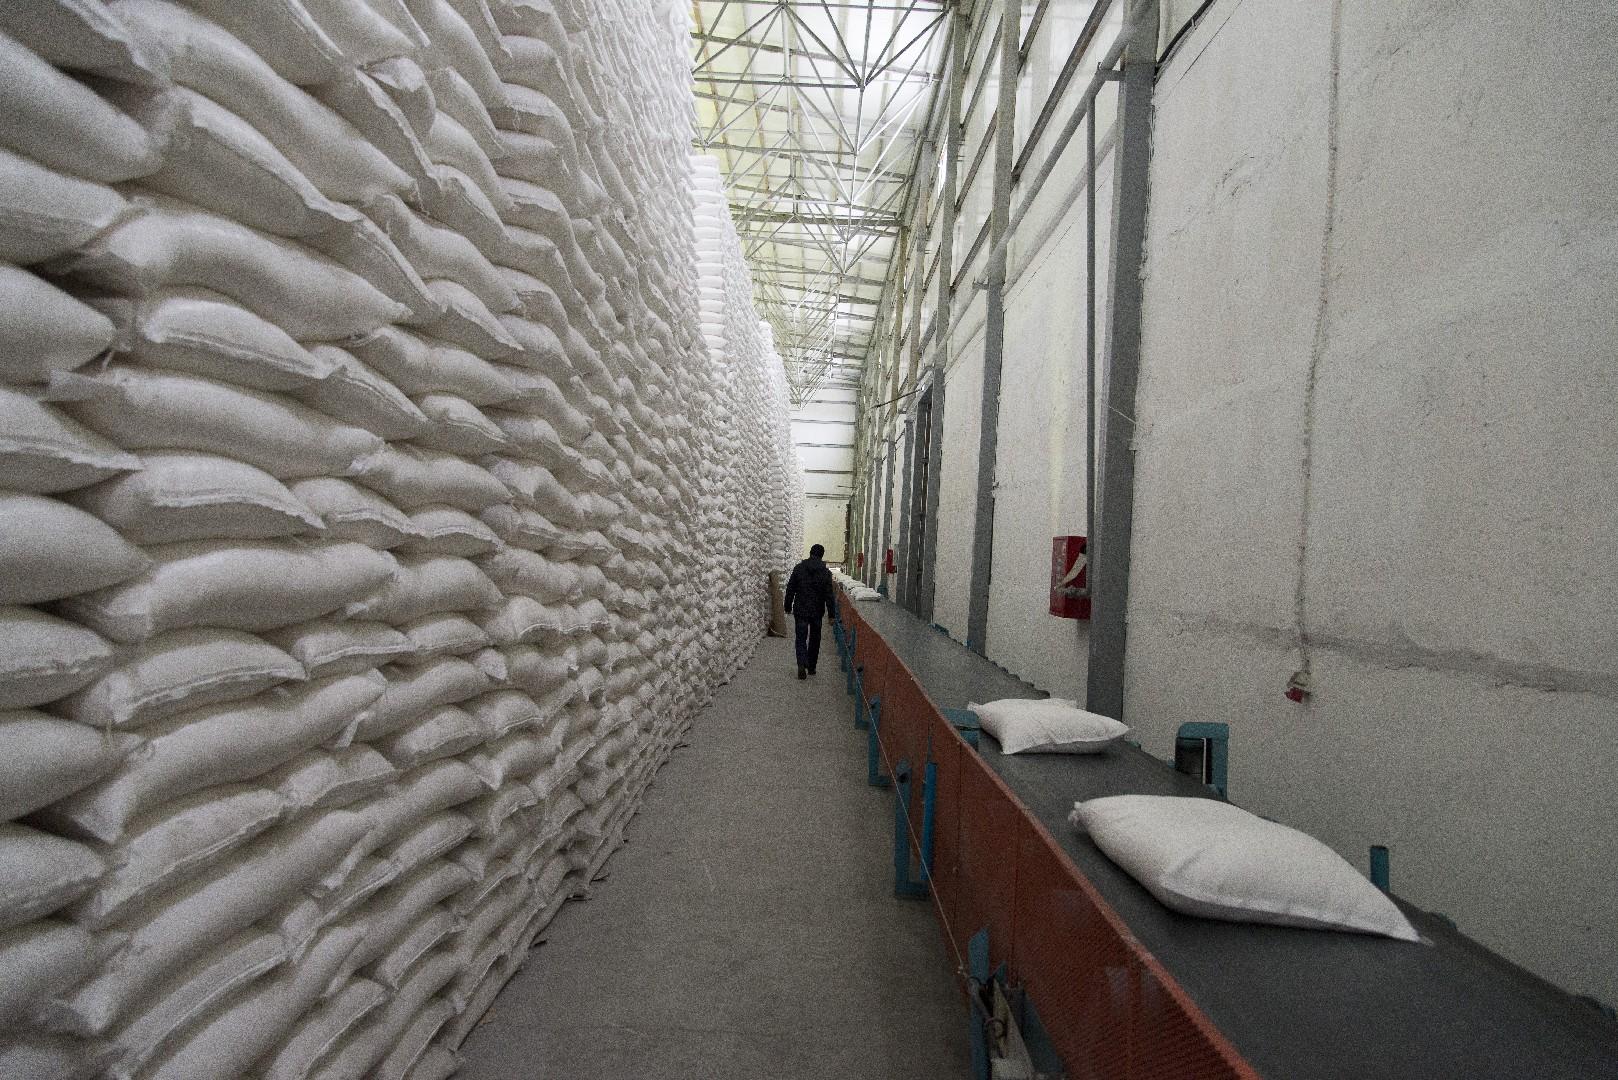 Сахарные заводы Краснодарского края выработали рекордные 1,5 млн. тонн сахара